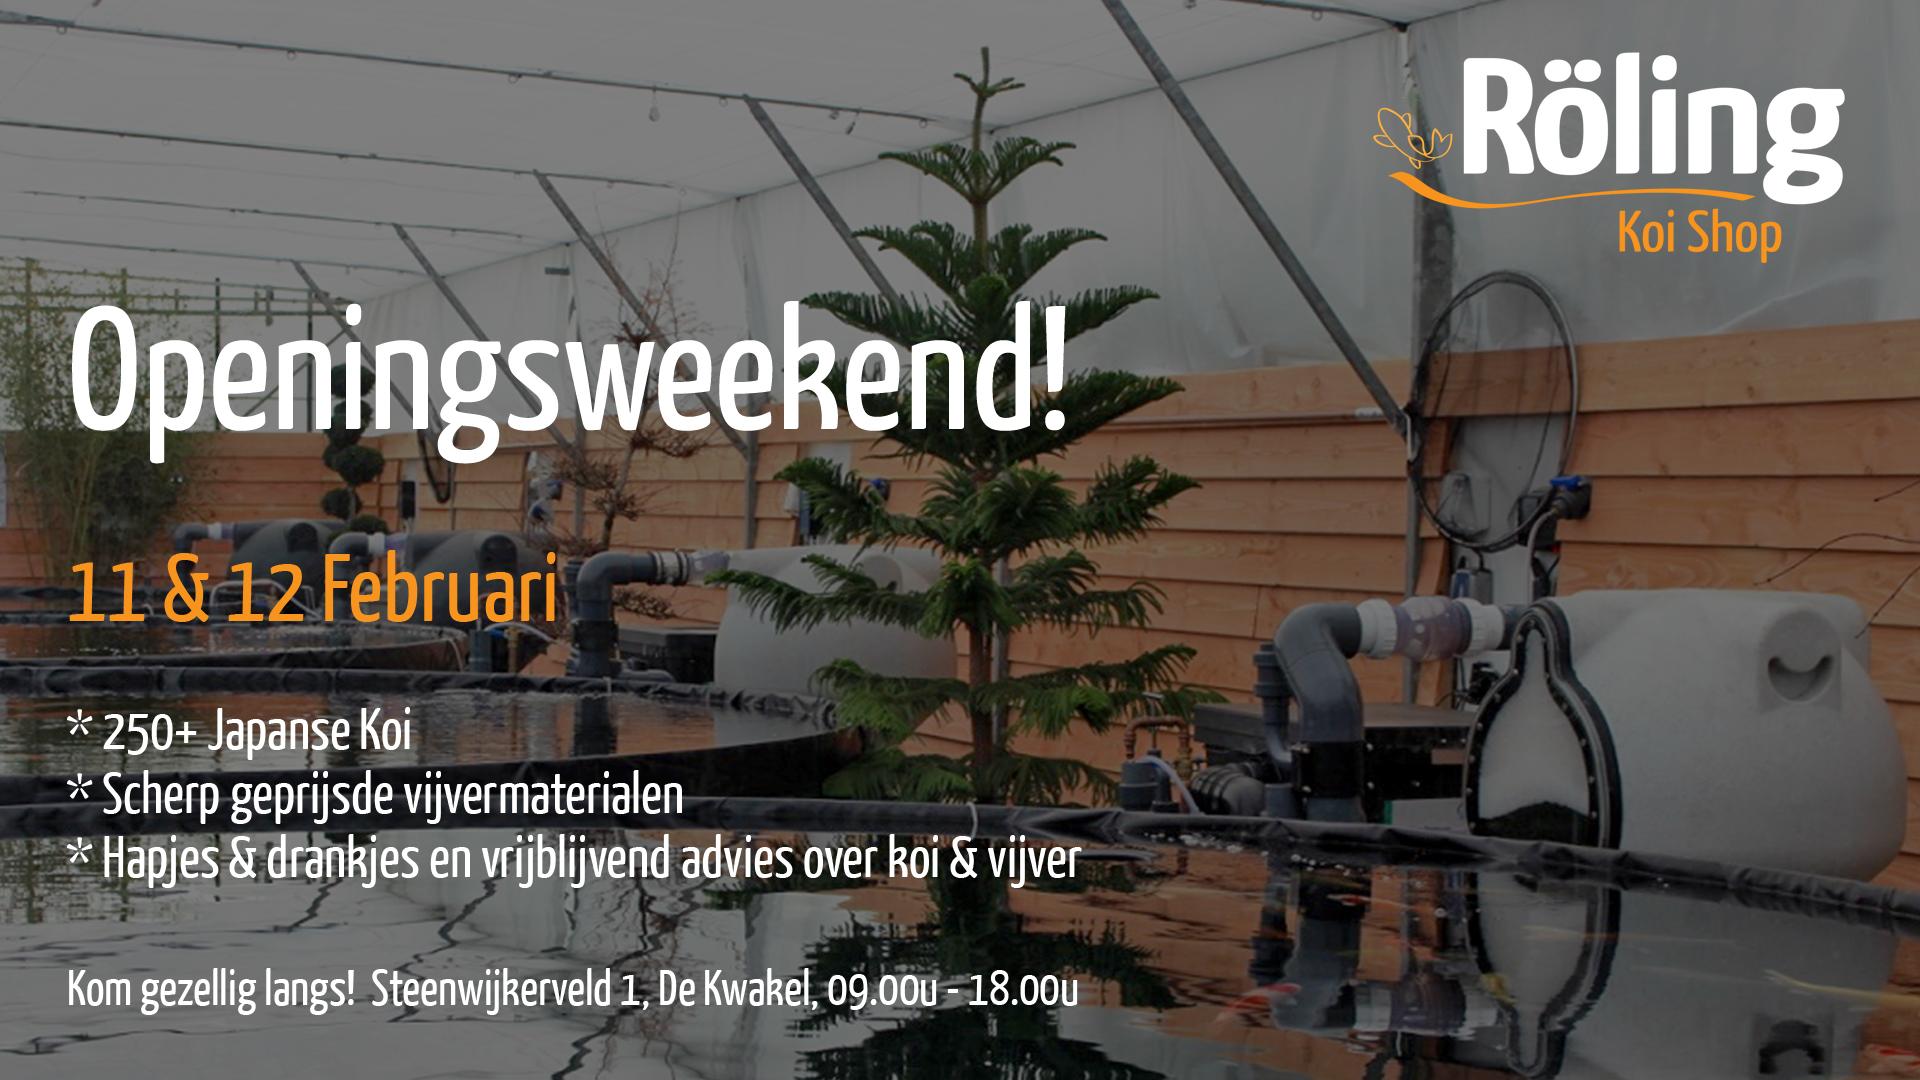 Openingsweekend Koishop FB event